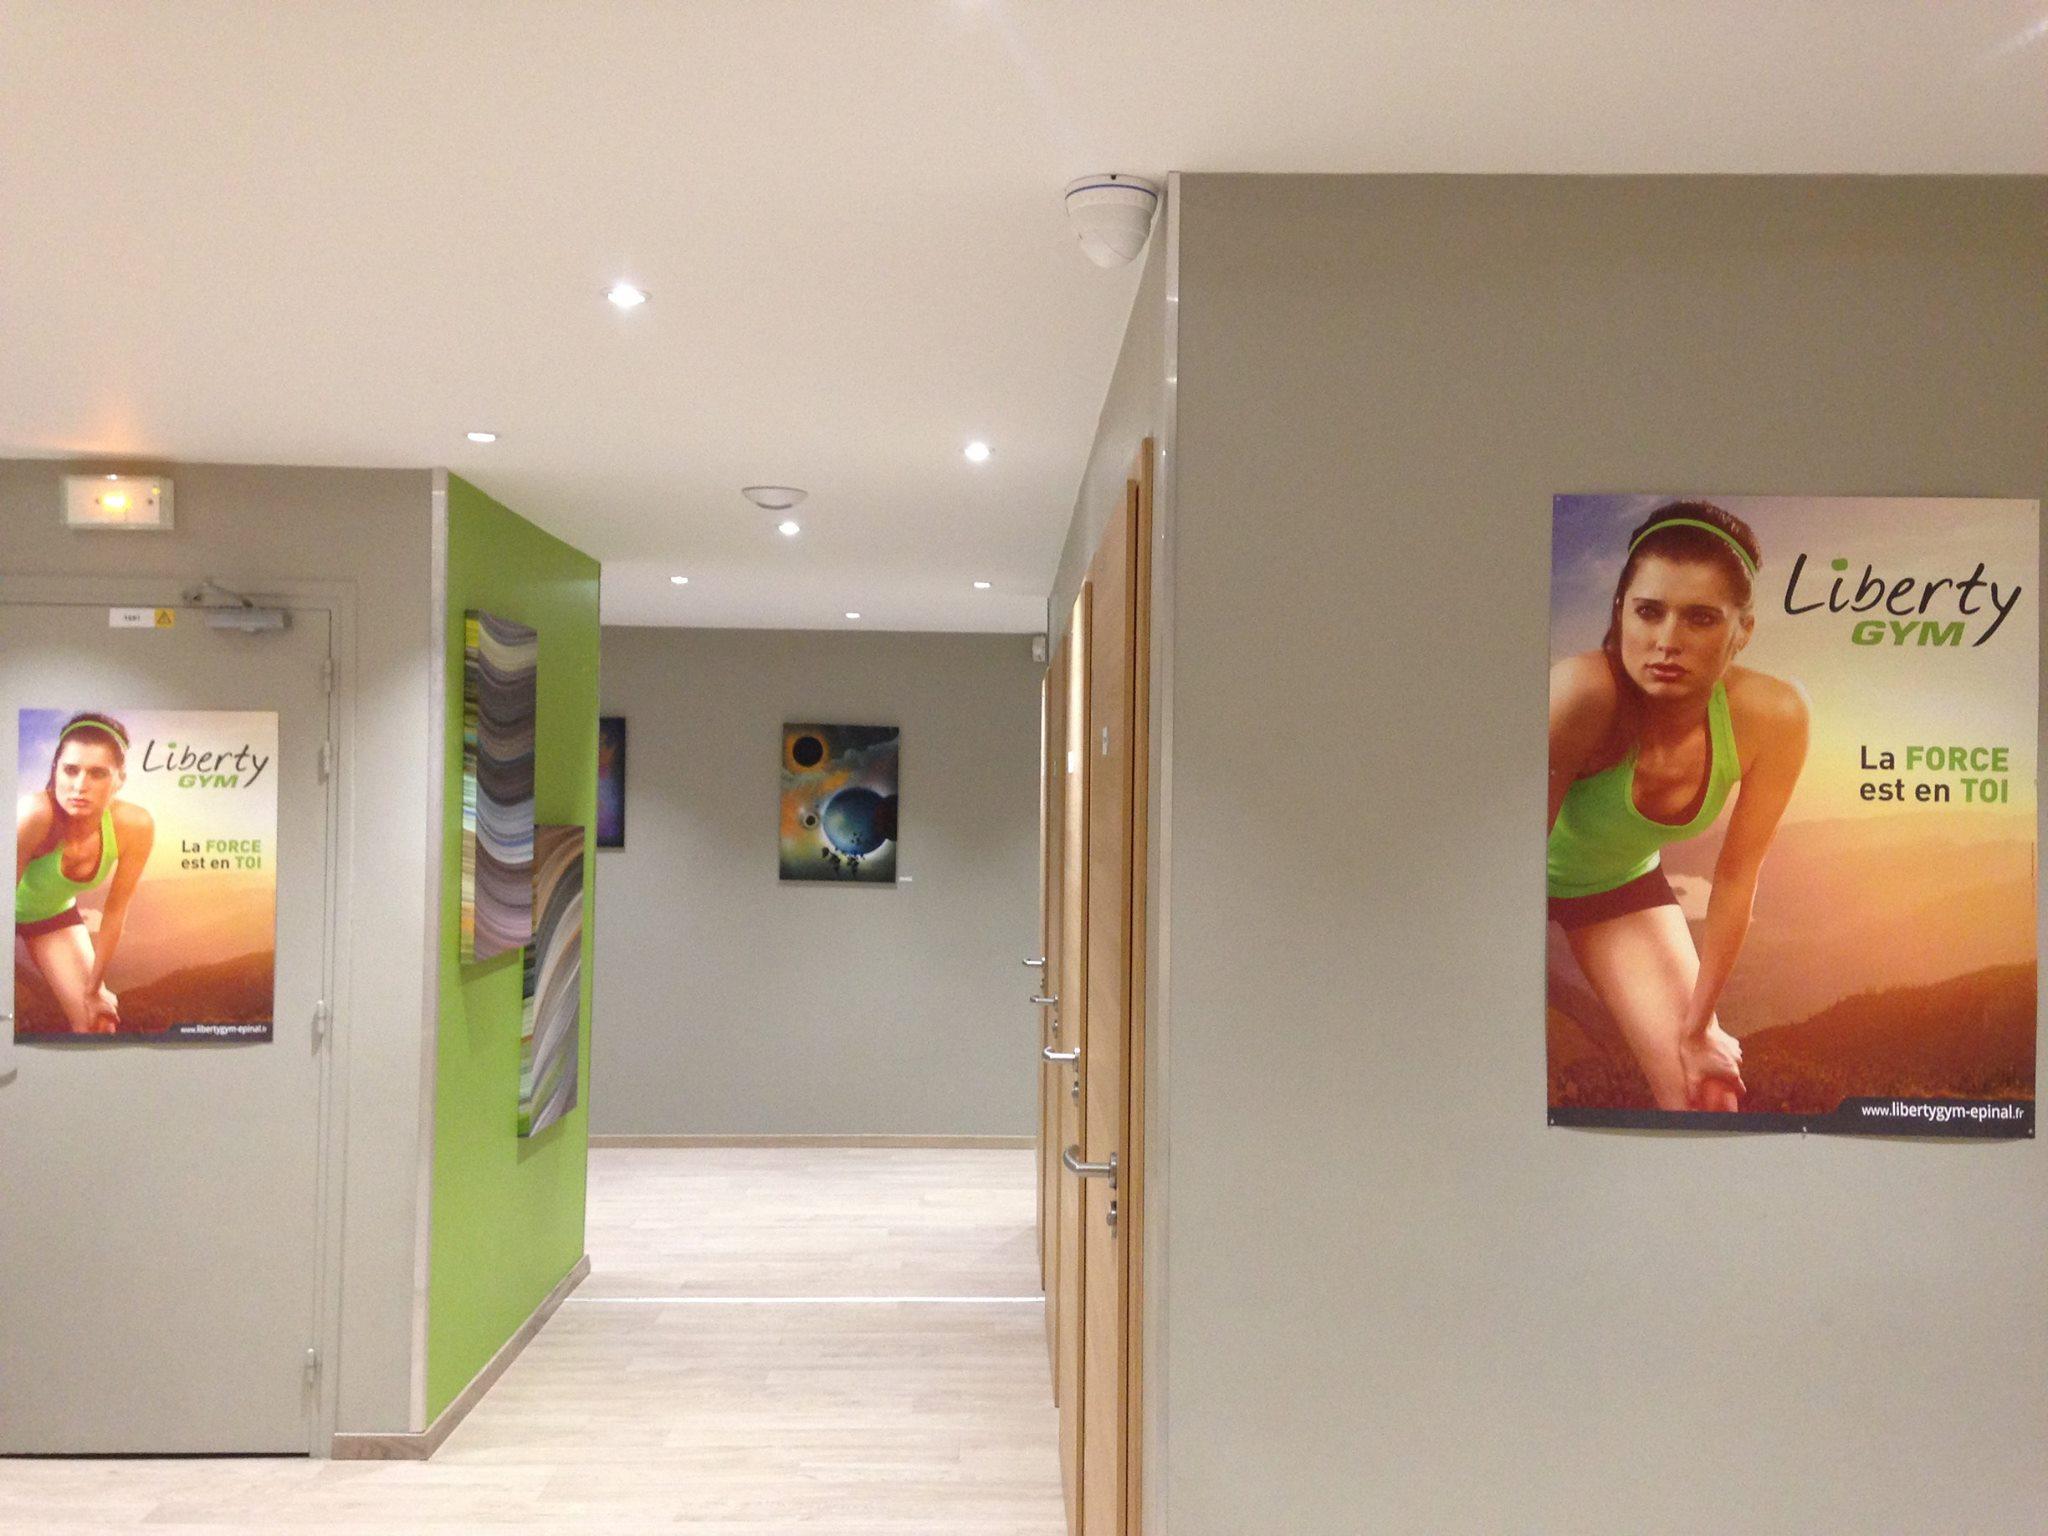 liberty gym pinal salles de. Black Bedroom Furniture Sets. Home Design Ideas